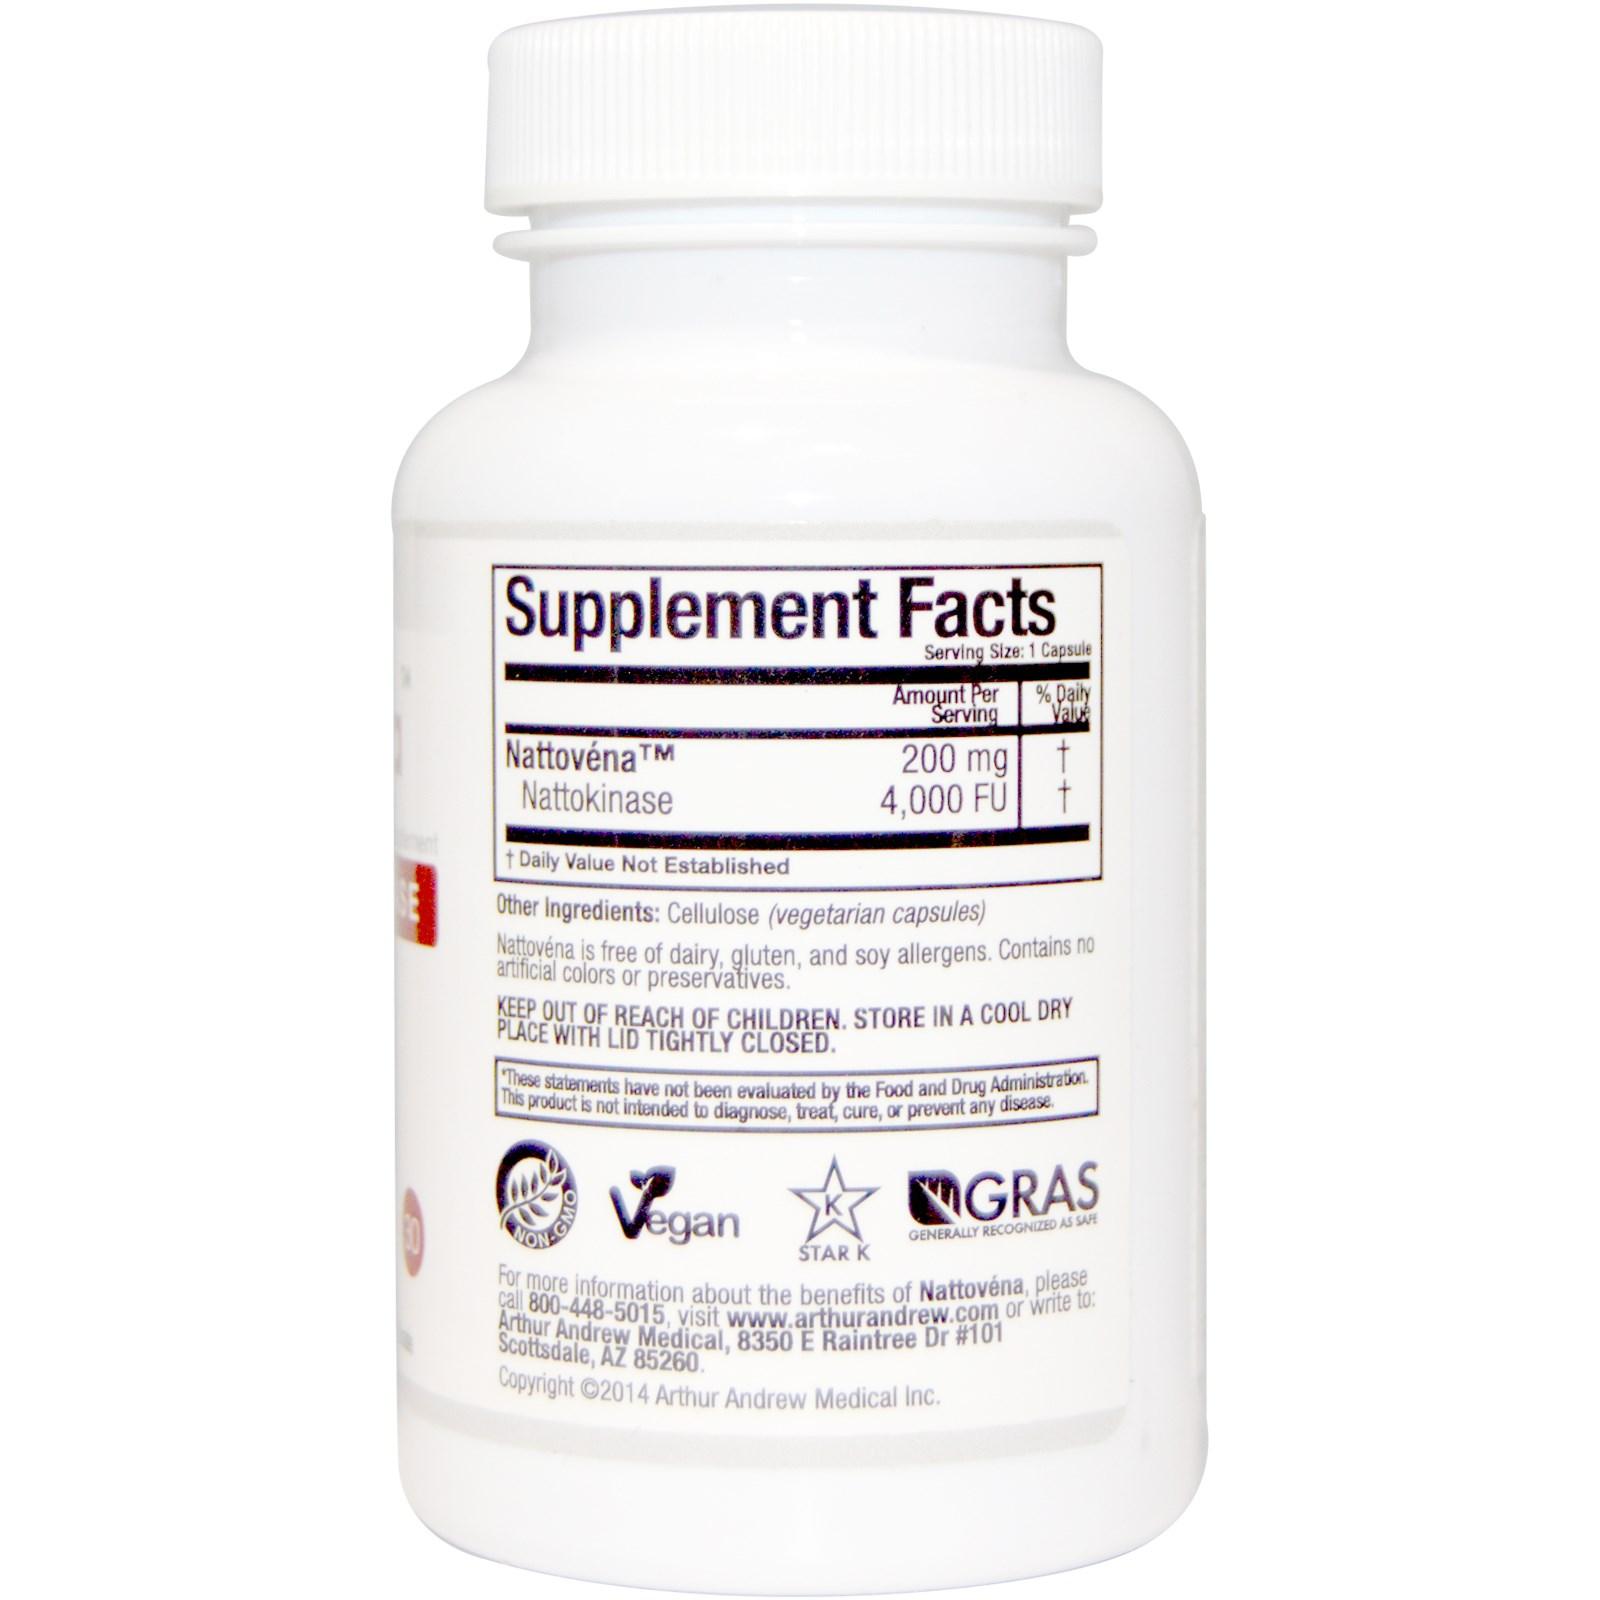 Arthur Andrew Medical, Nattovena, Pure Nattokinase, 200 mg, 30 Capsules